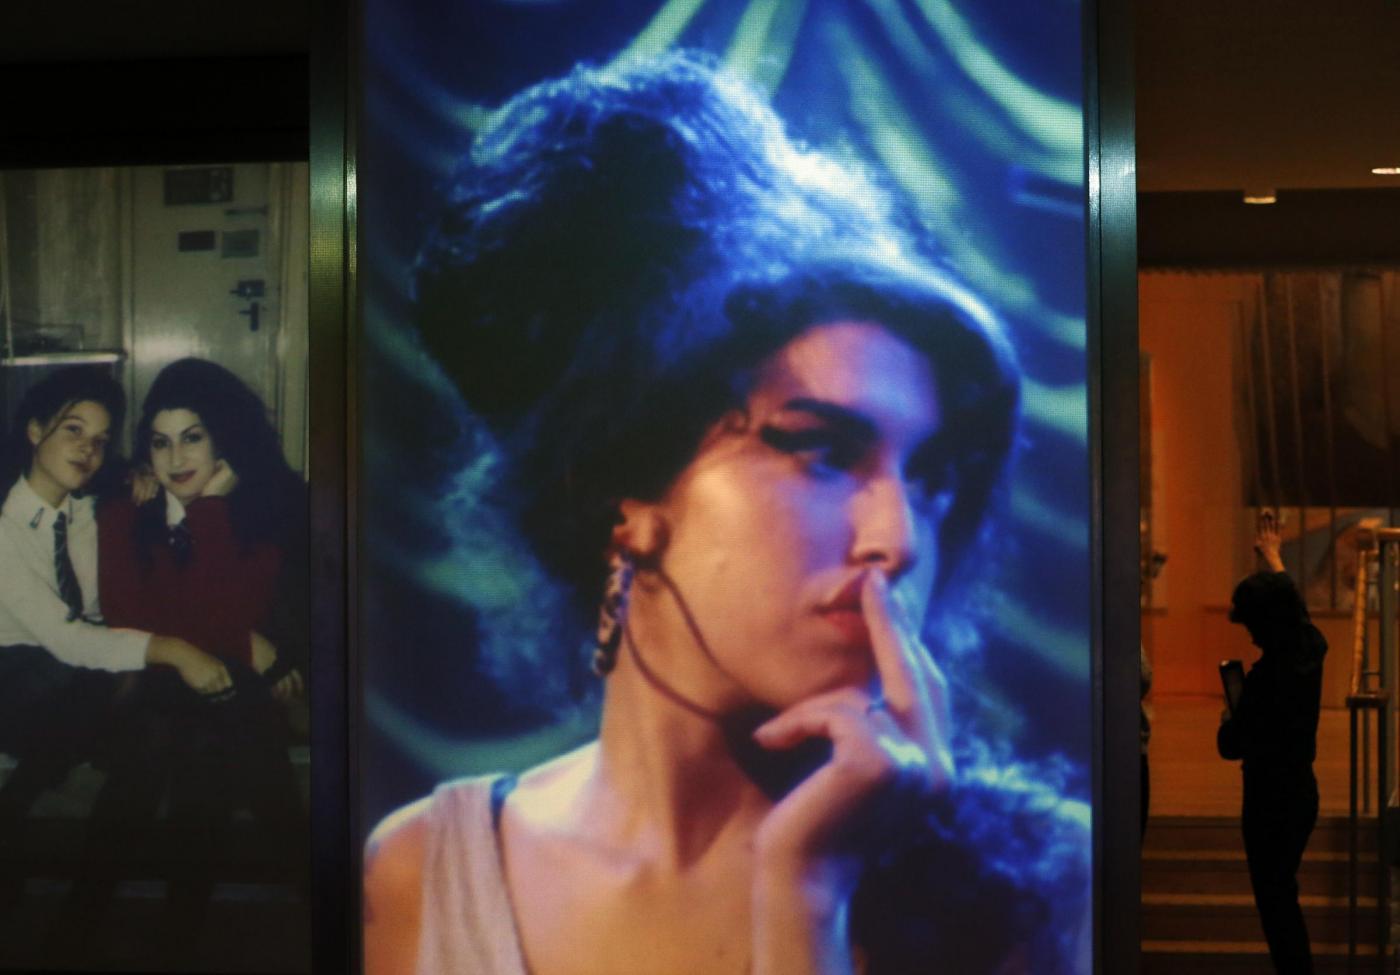 Londra, al via la mostra Amy Winehouse A Family Portrait 04